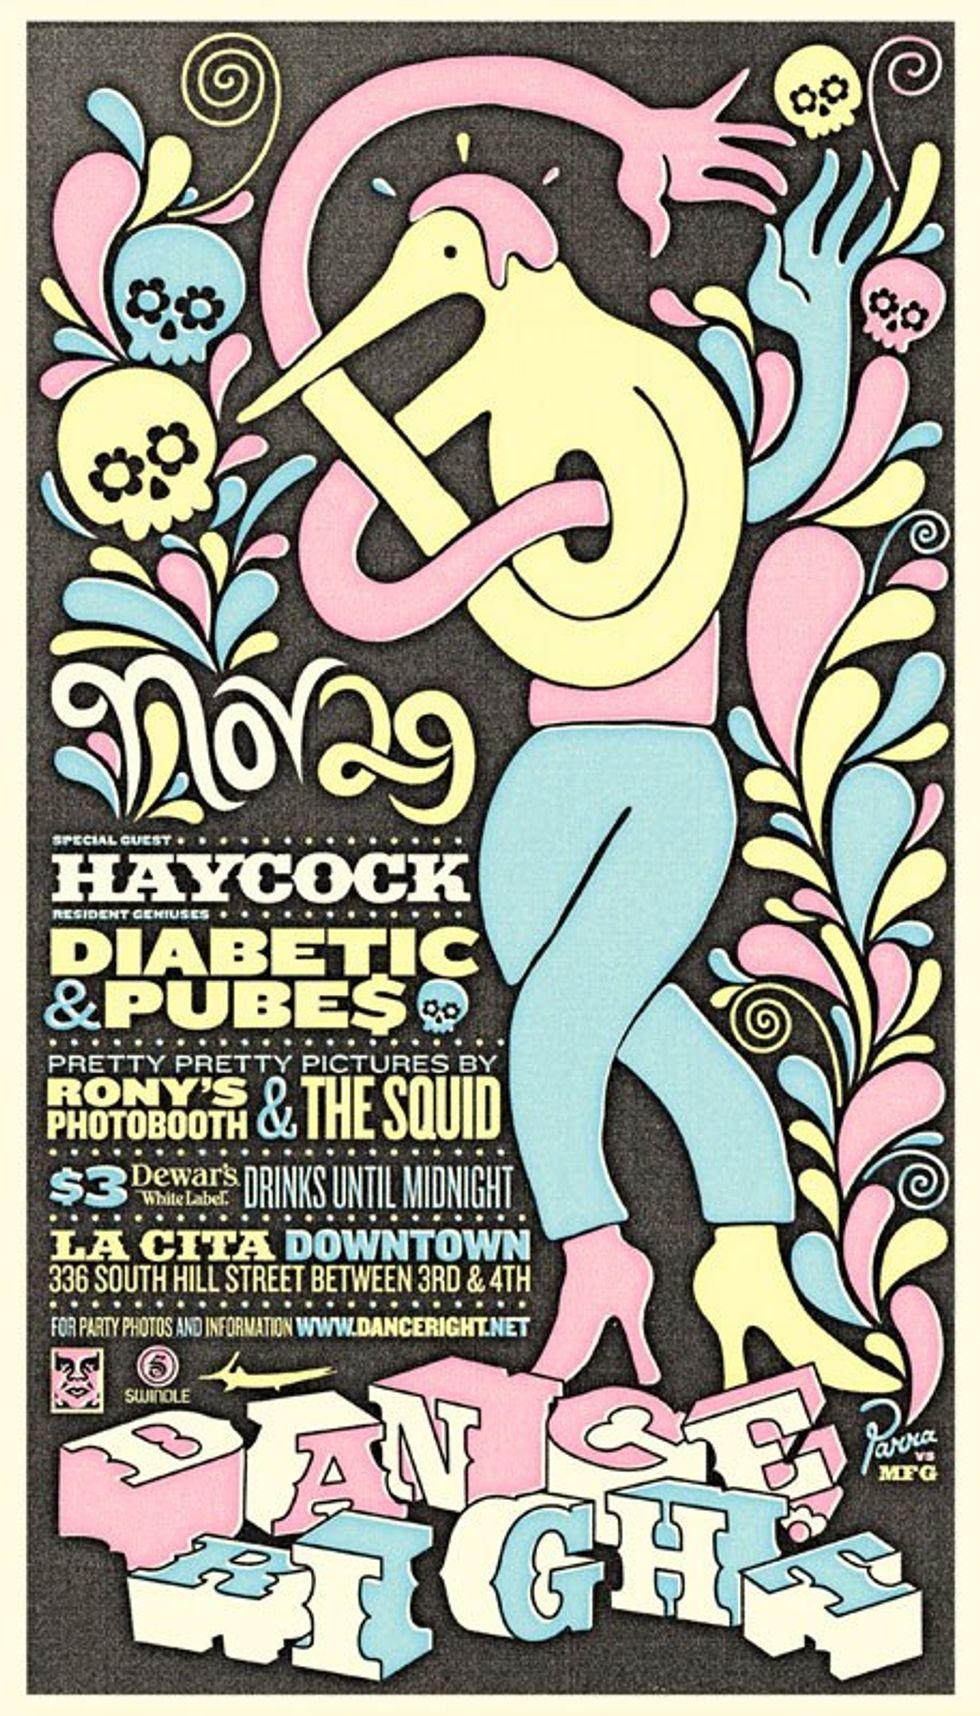 R.I.P. Dance Right Los Angeles